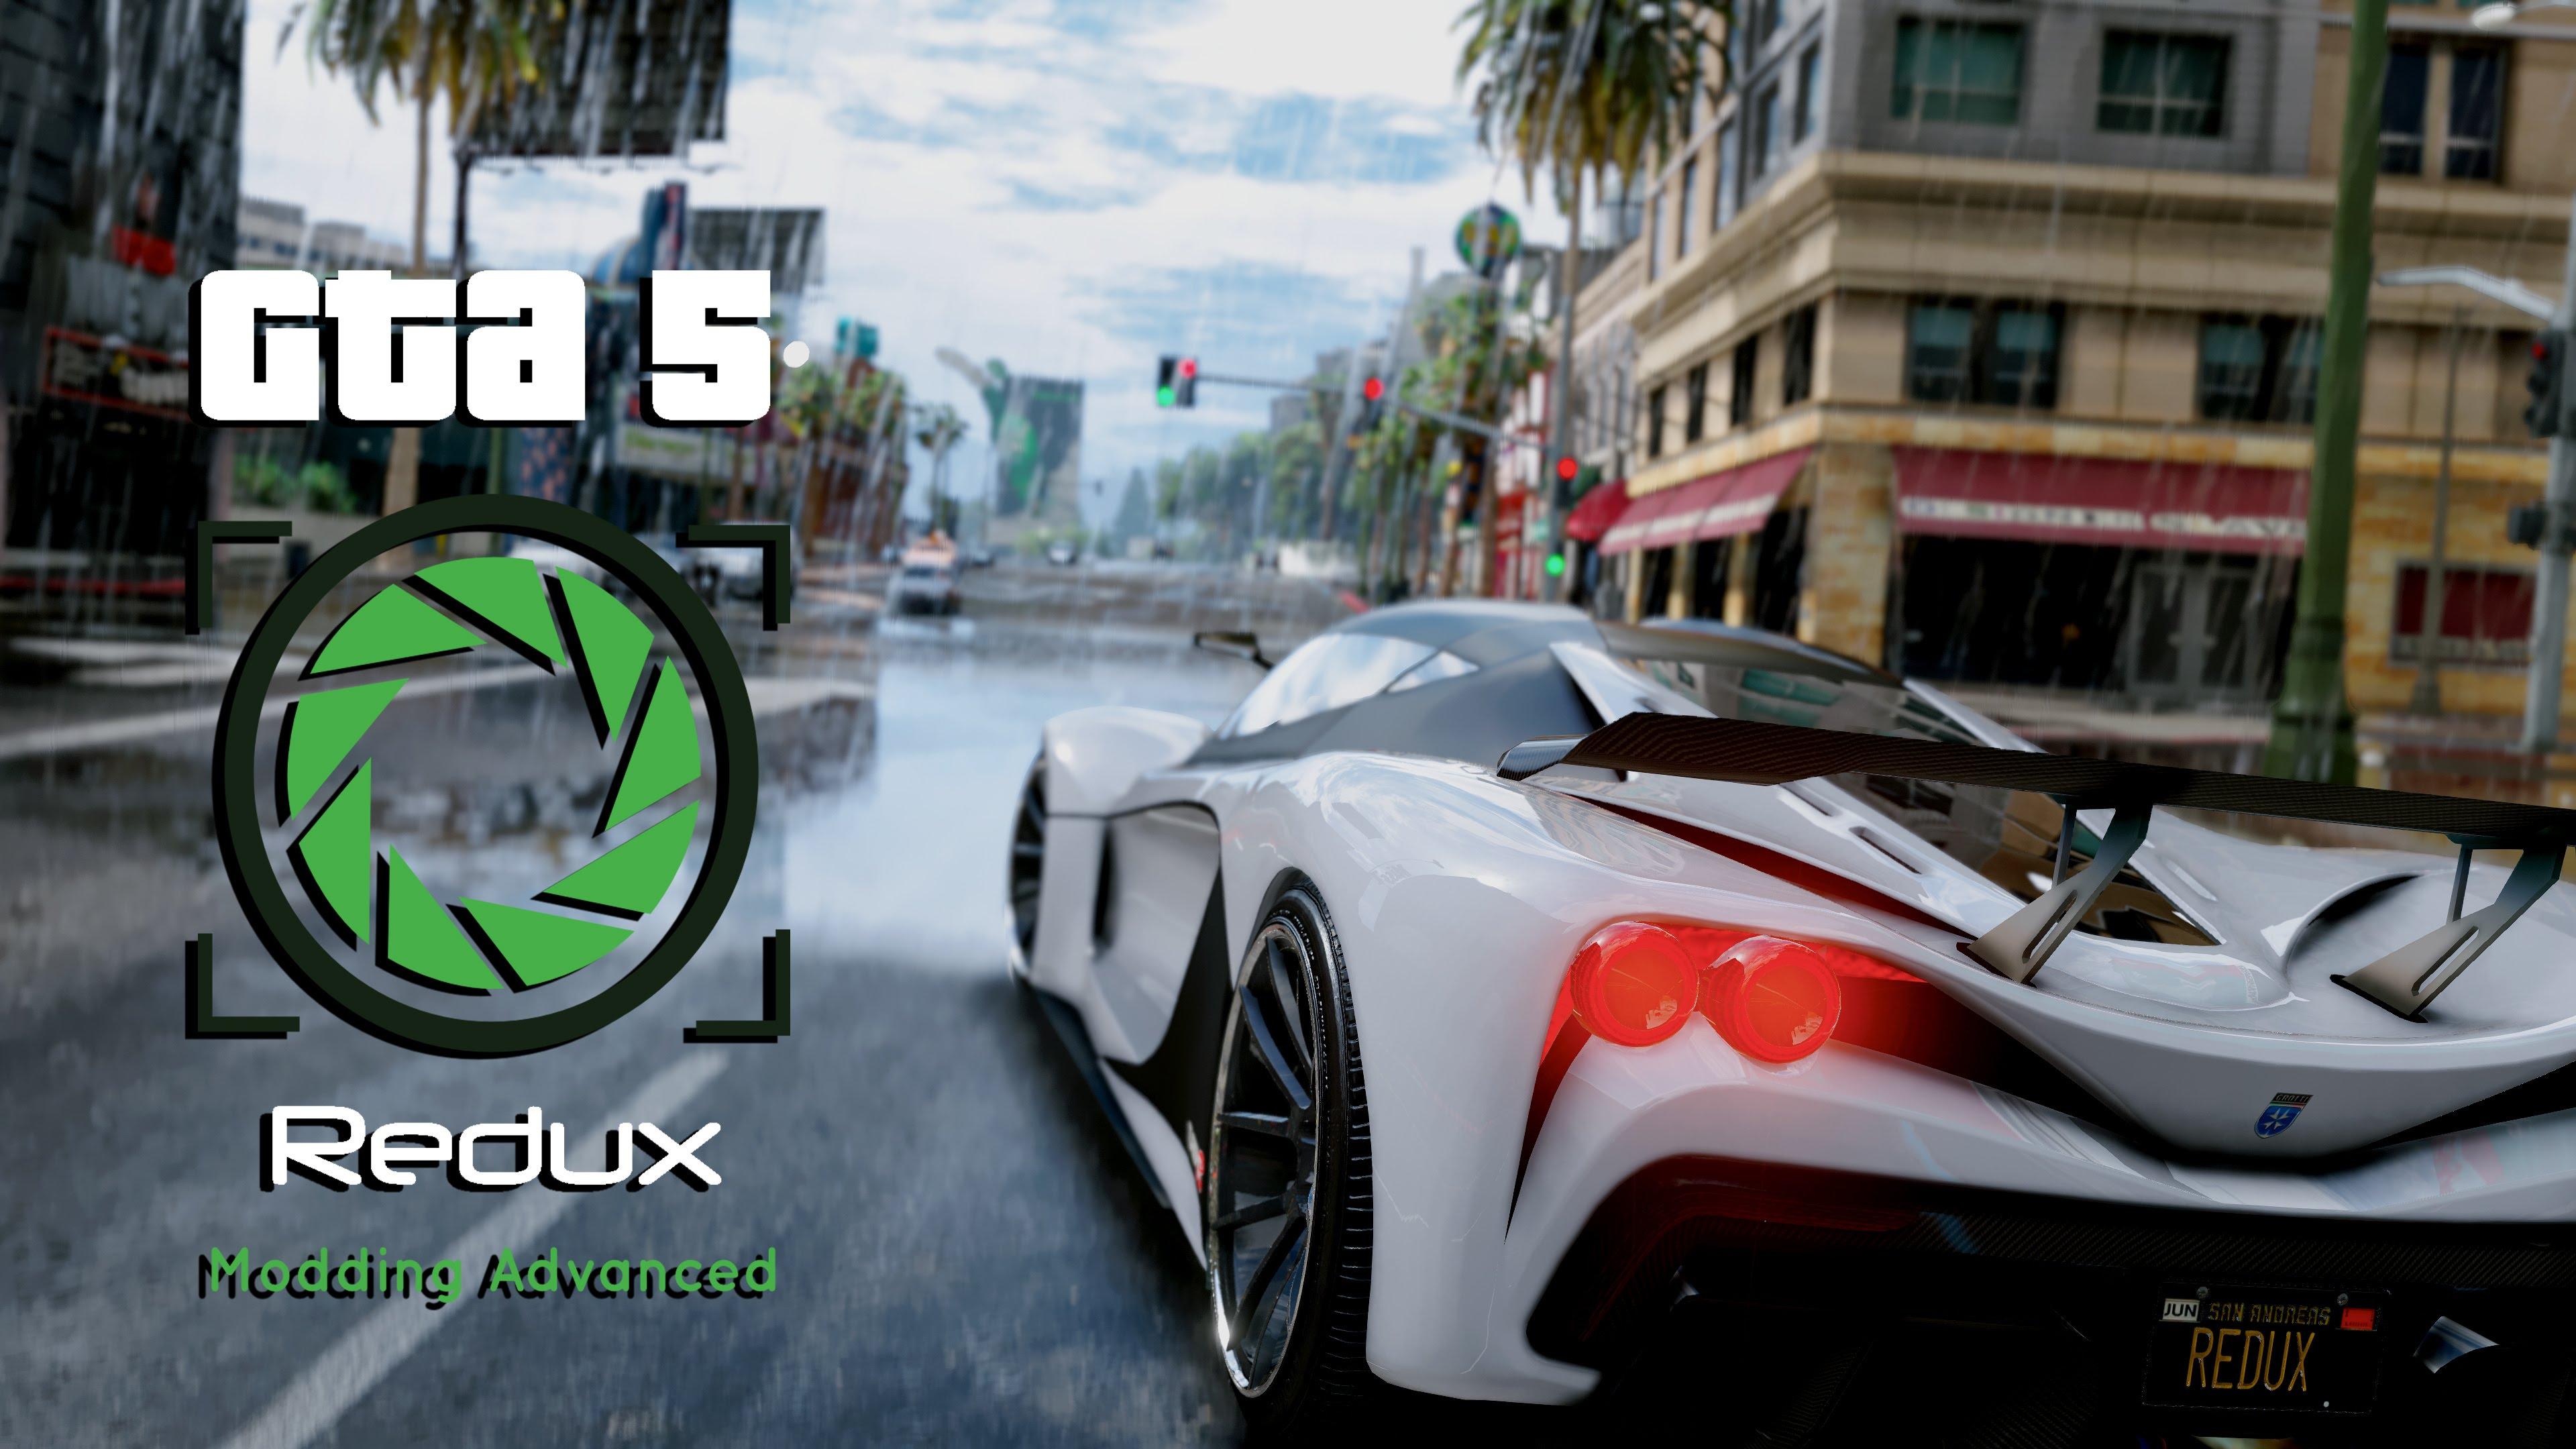 GTA V Redux (Graphics Mod) v1.7 for GTA 5